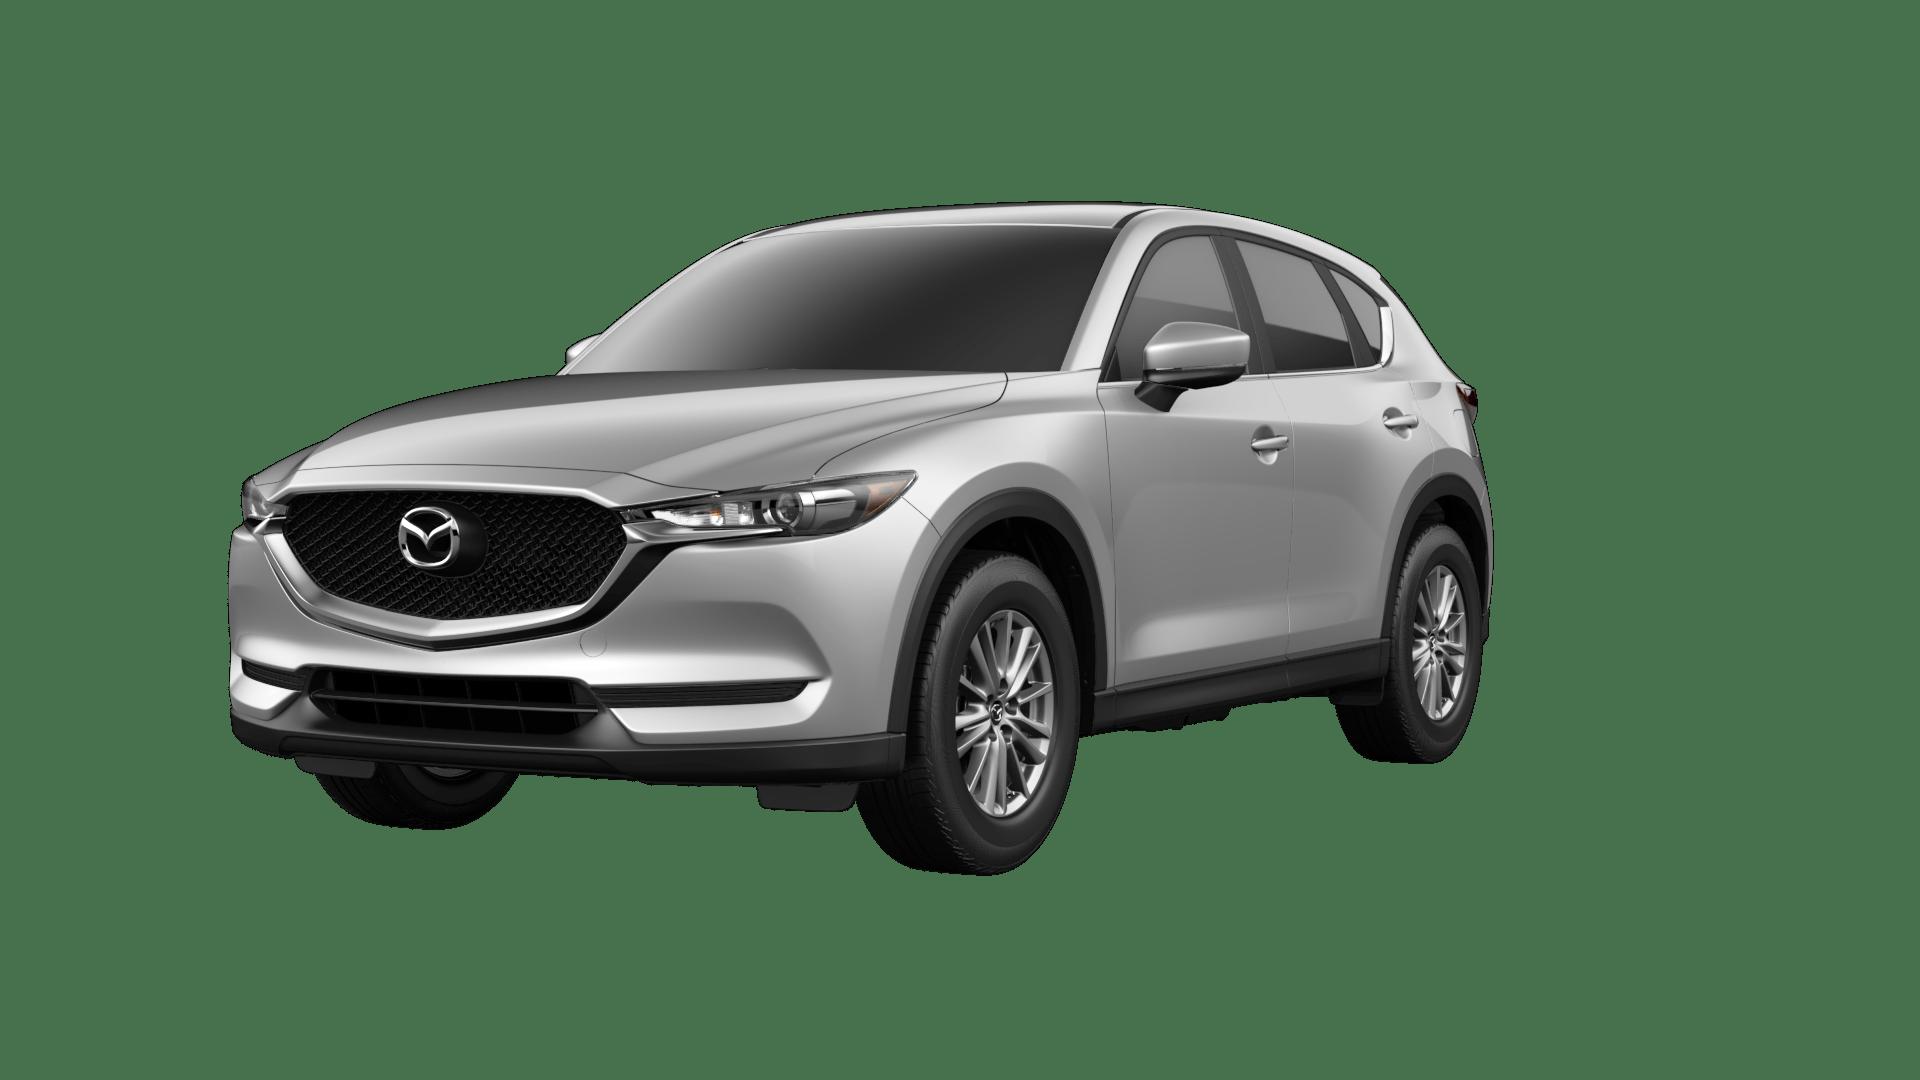 2018 Mazda CX-5 SPORT FWD